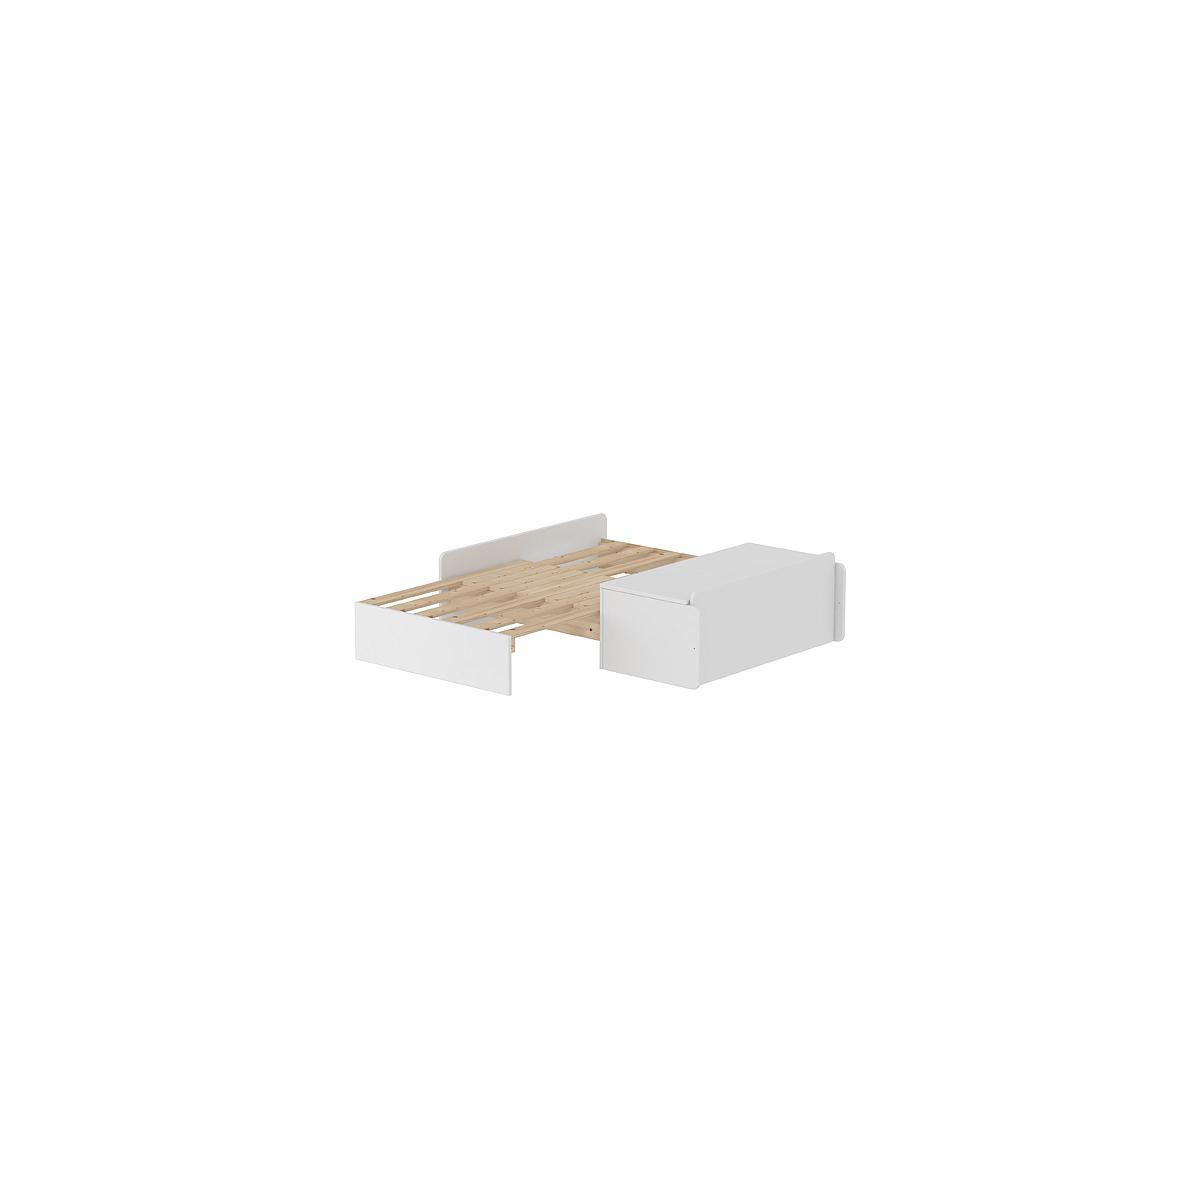 Sofá-cama Cama alta WHITE Flexa blanco